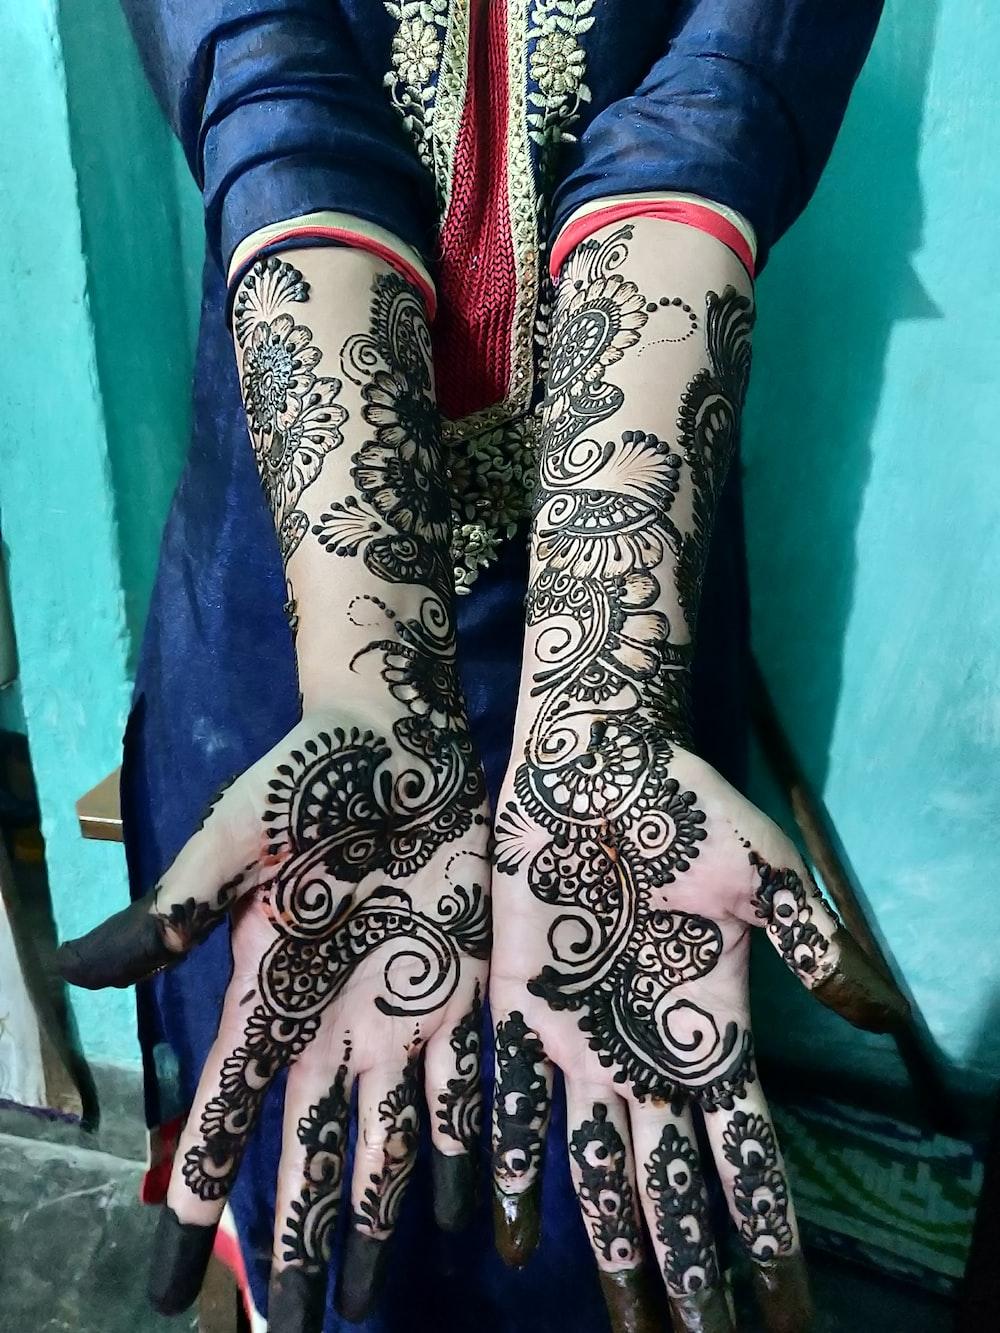 black mhendi tattoo close-up photography